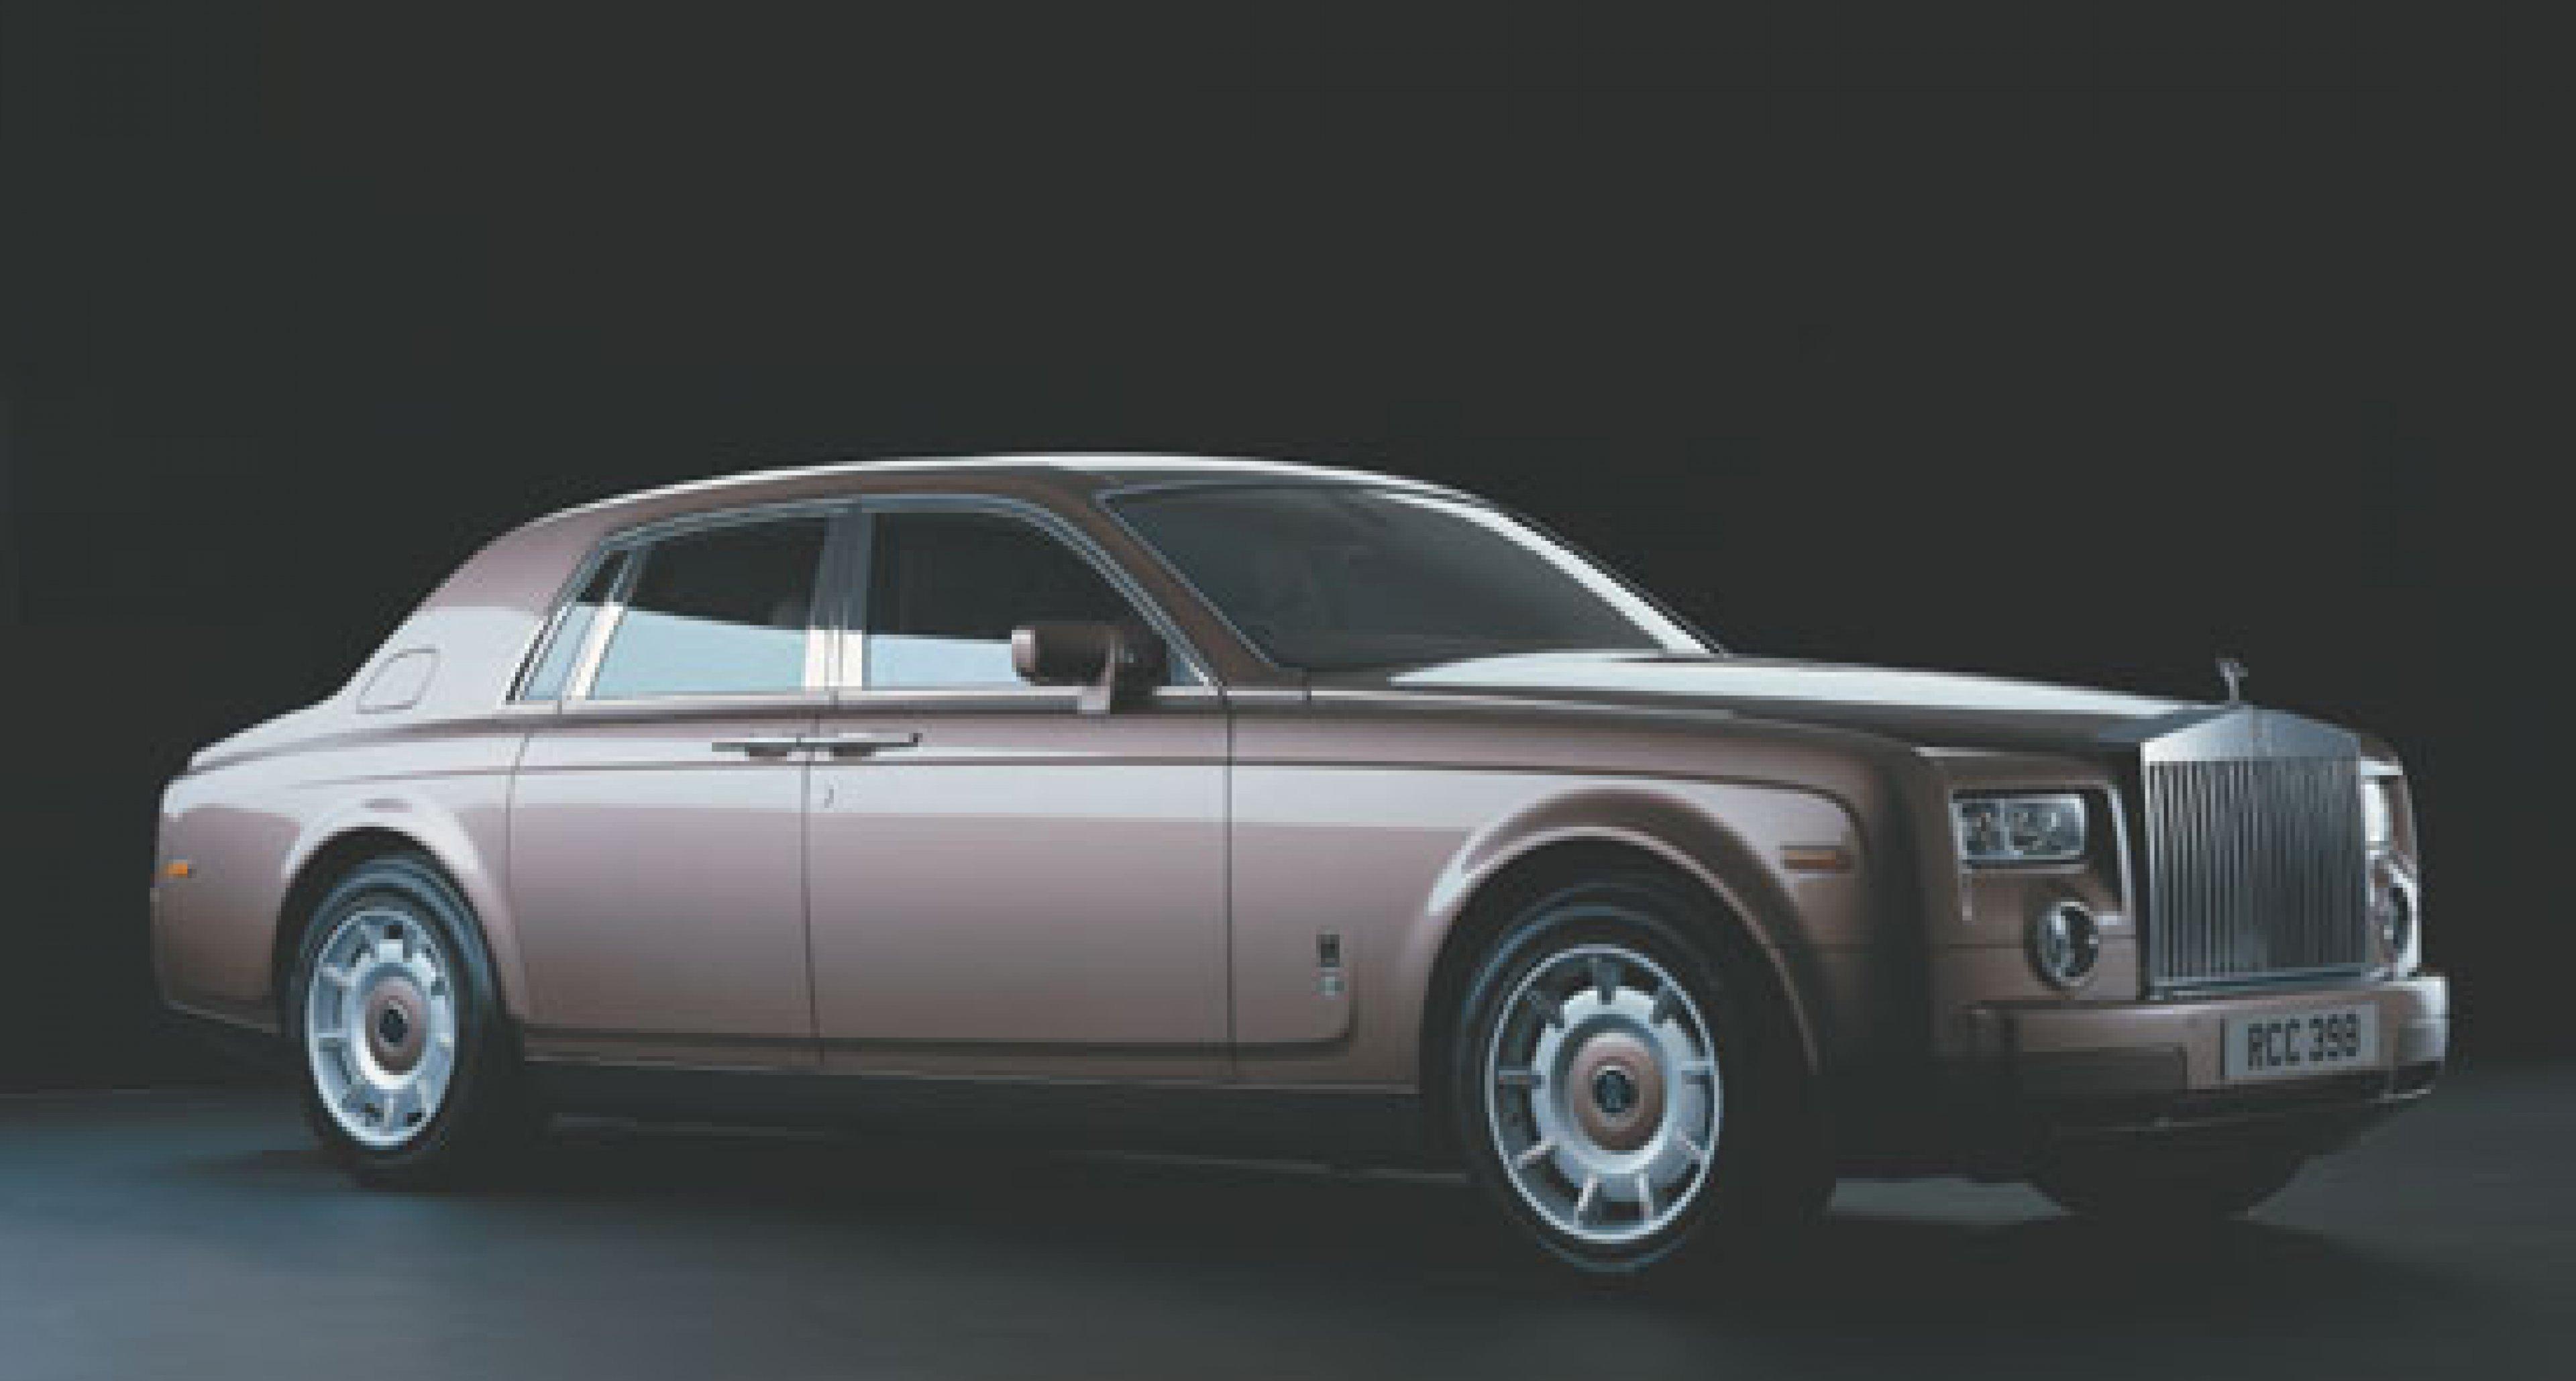 Goodwood launch for all new Rolls-Royce Phantom